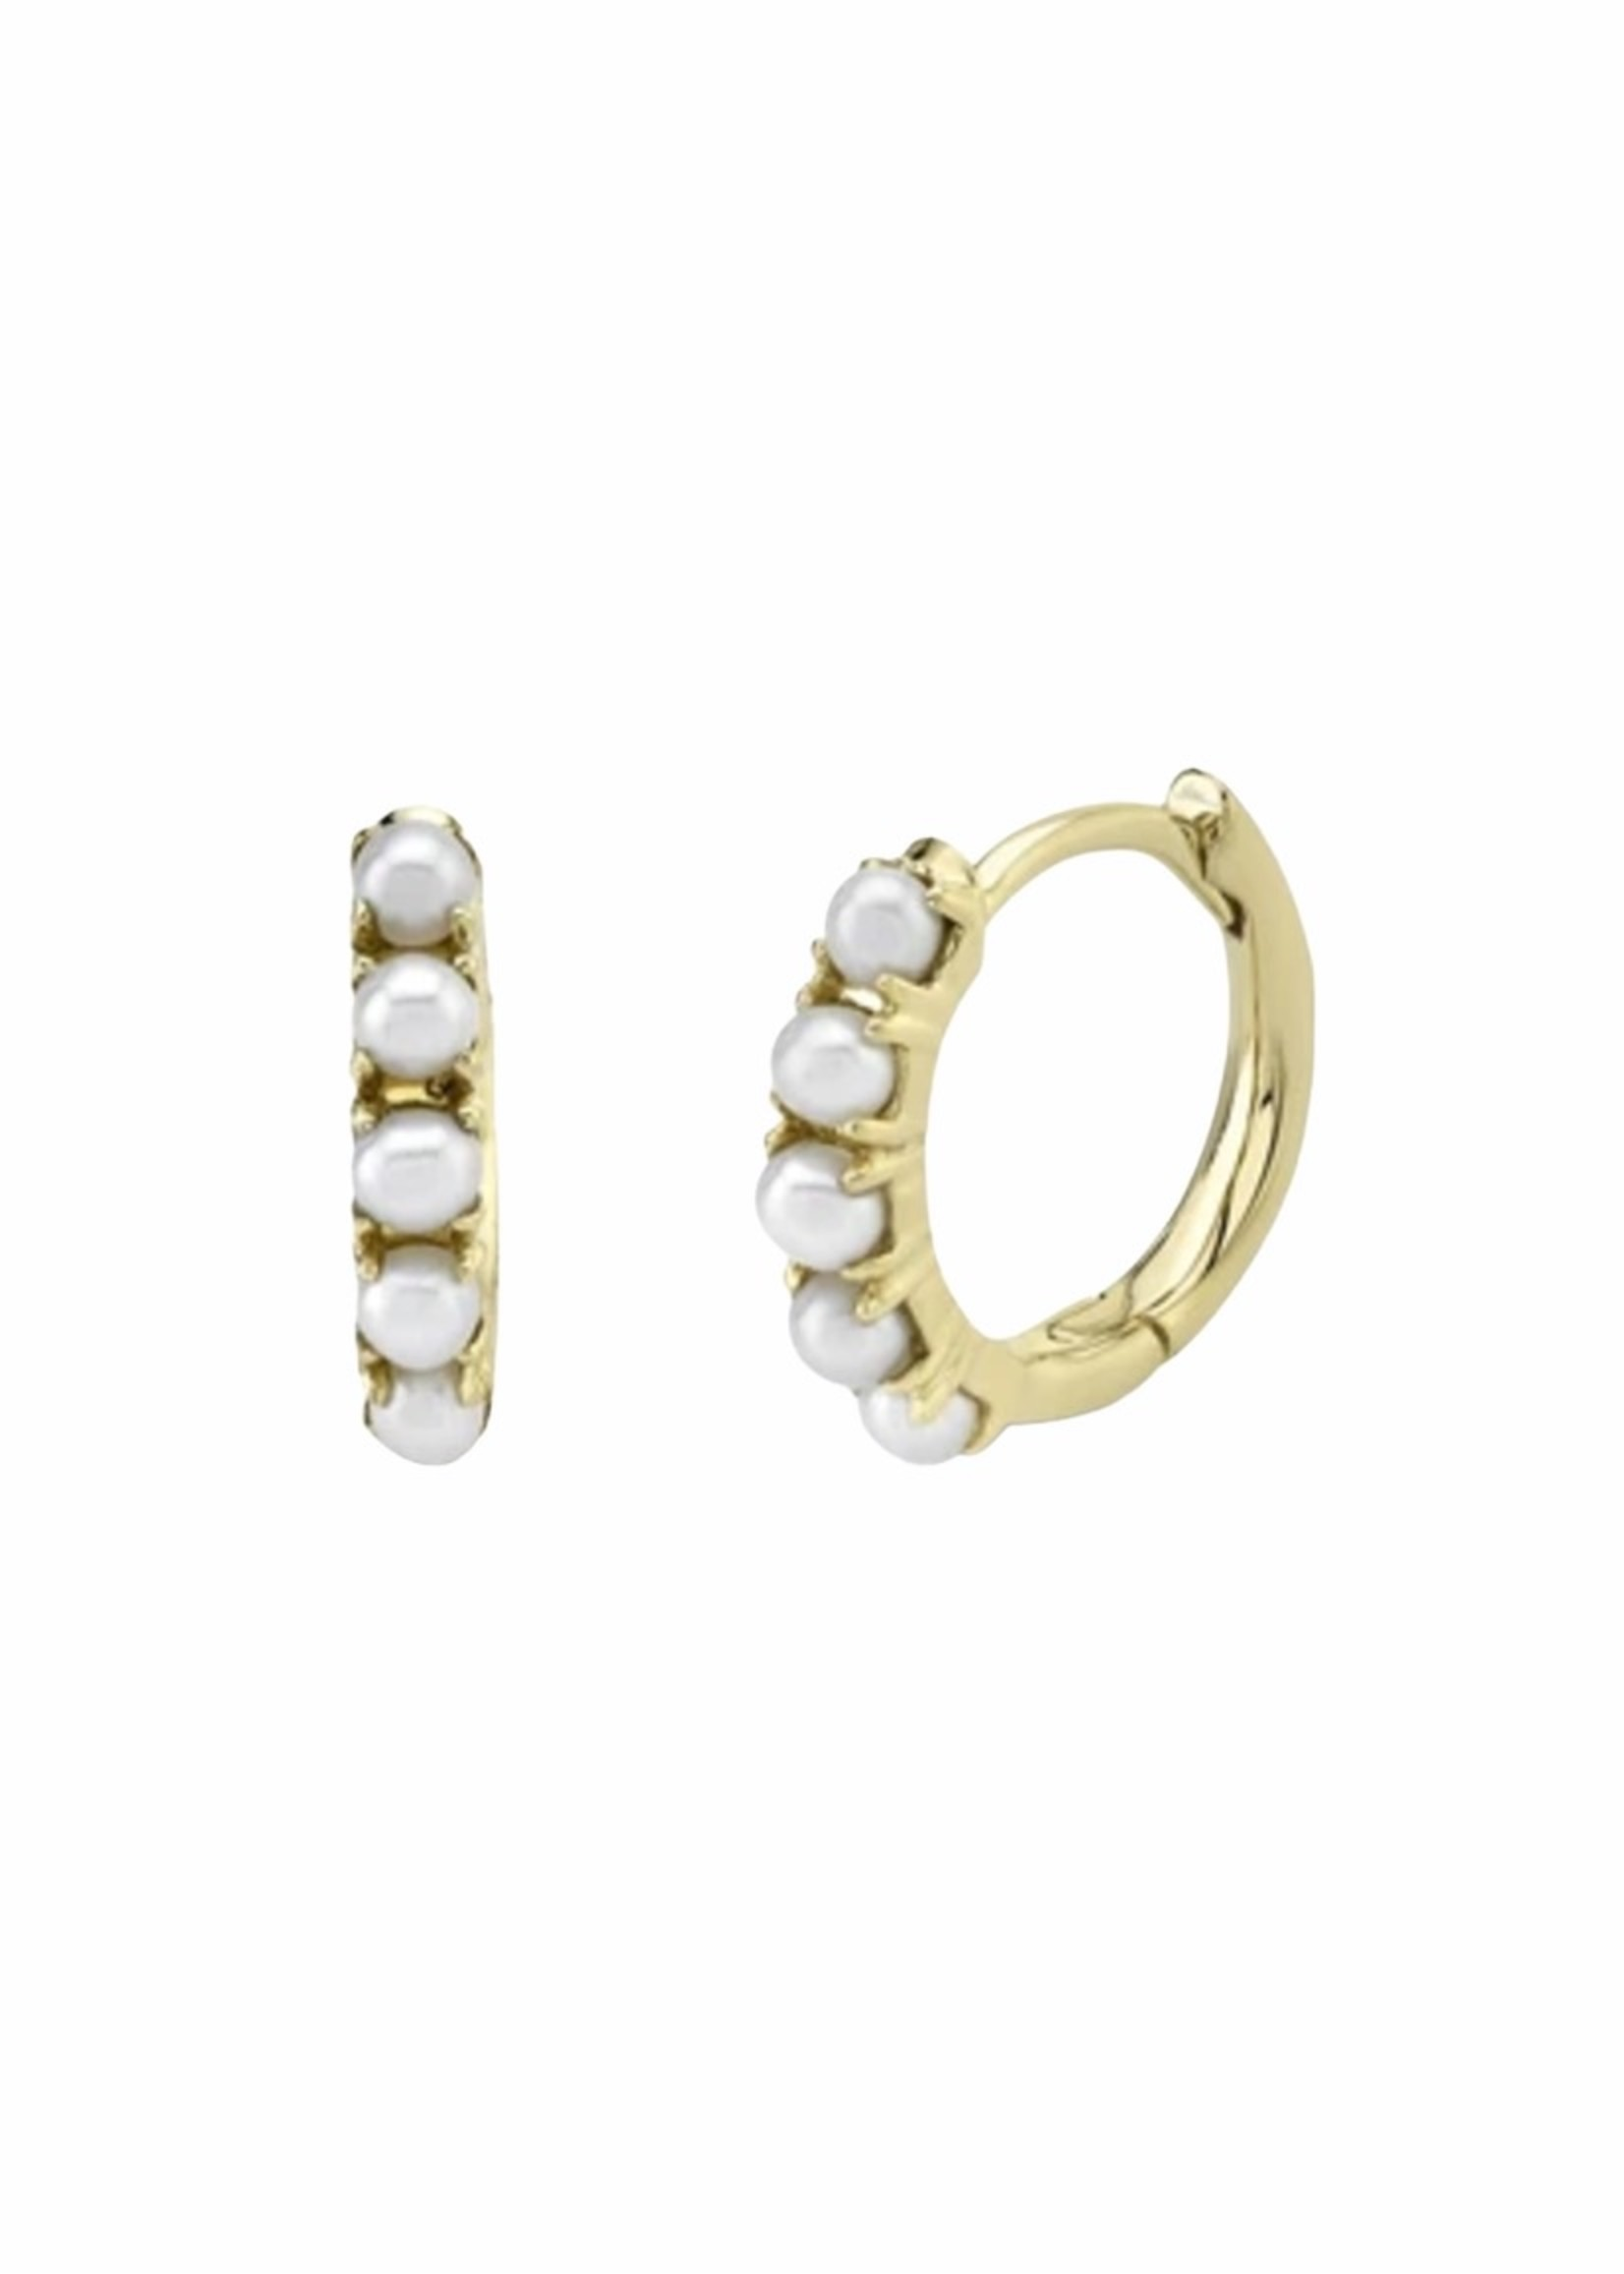 Jill Alberts Freshwater Pearl Huggie Earrings